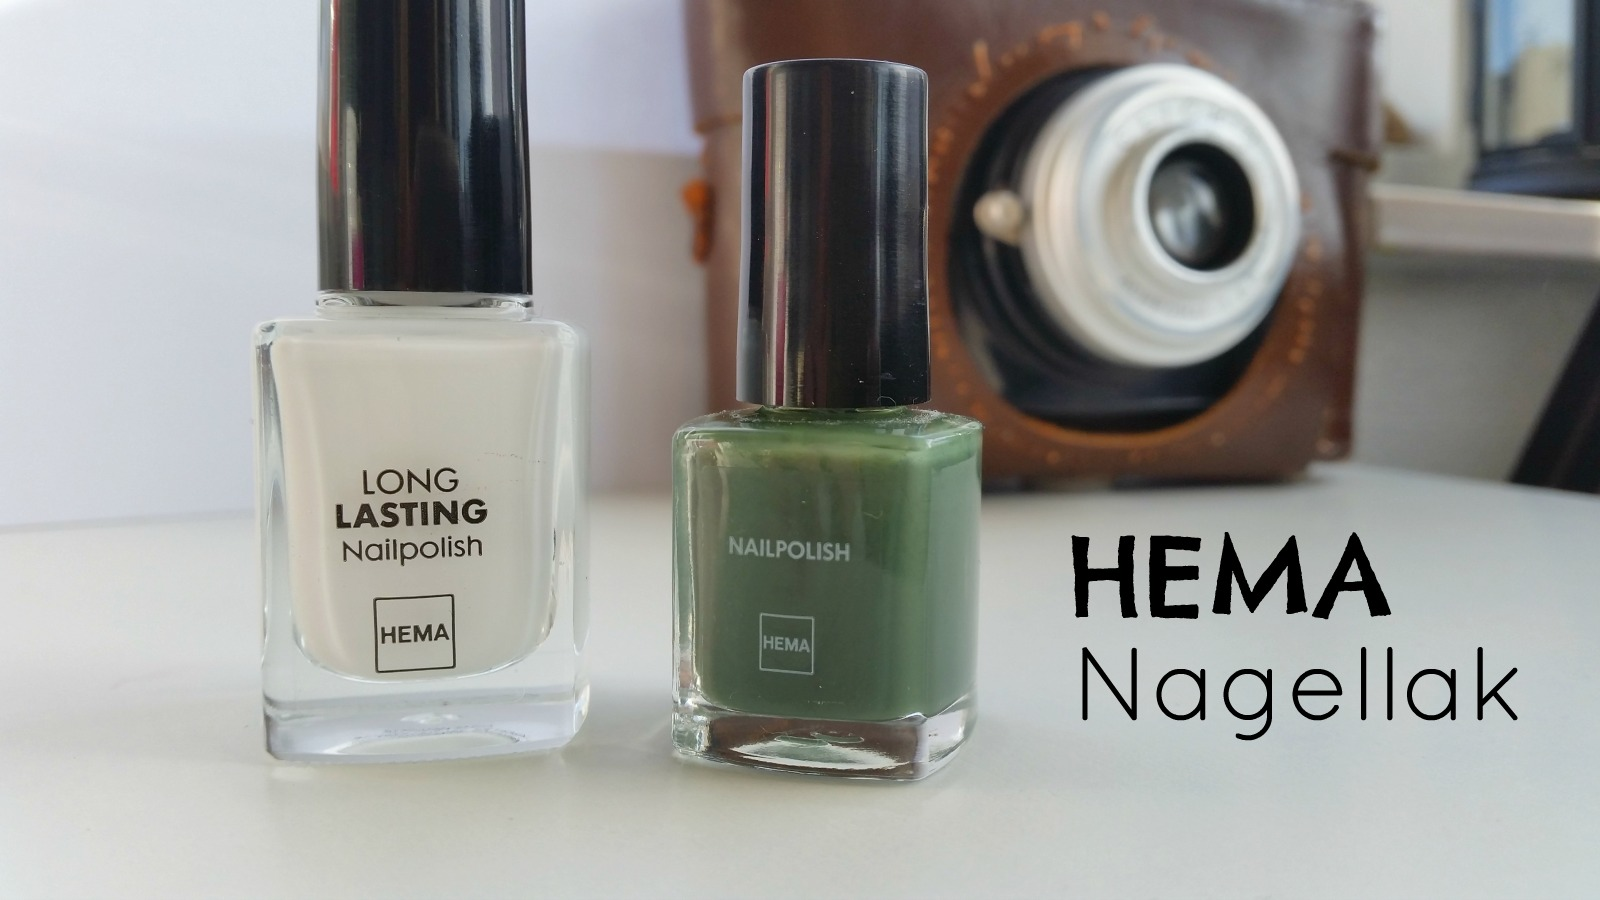 Hema.nagellak.2.0